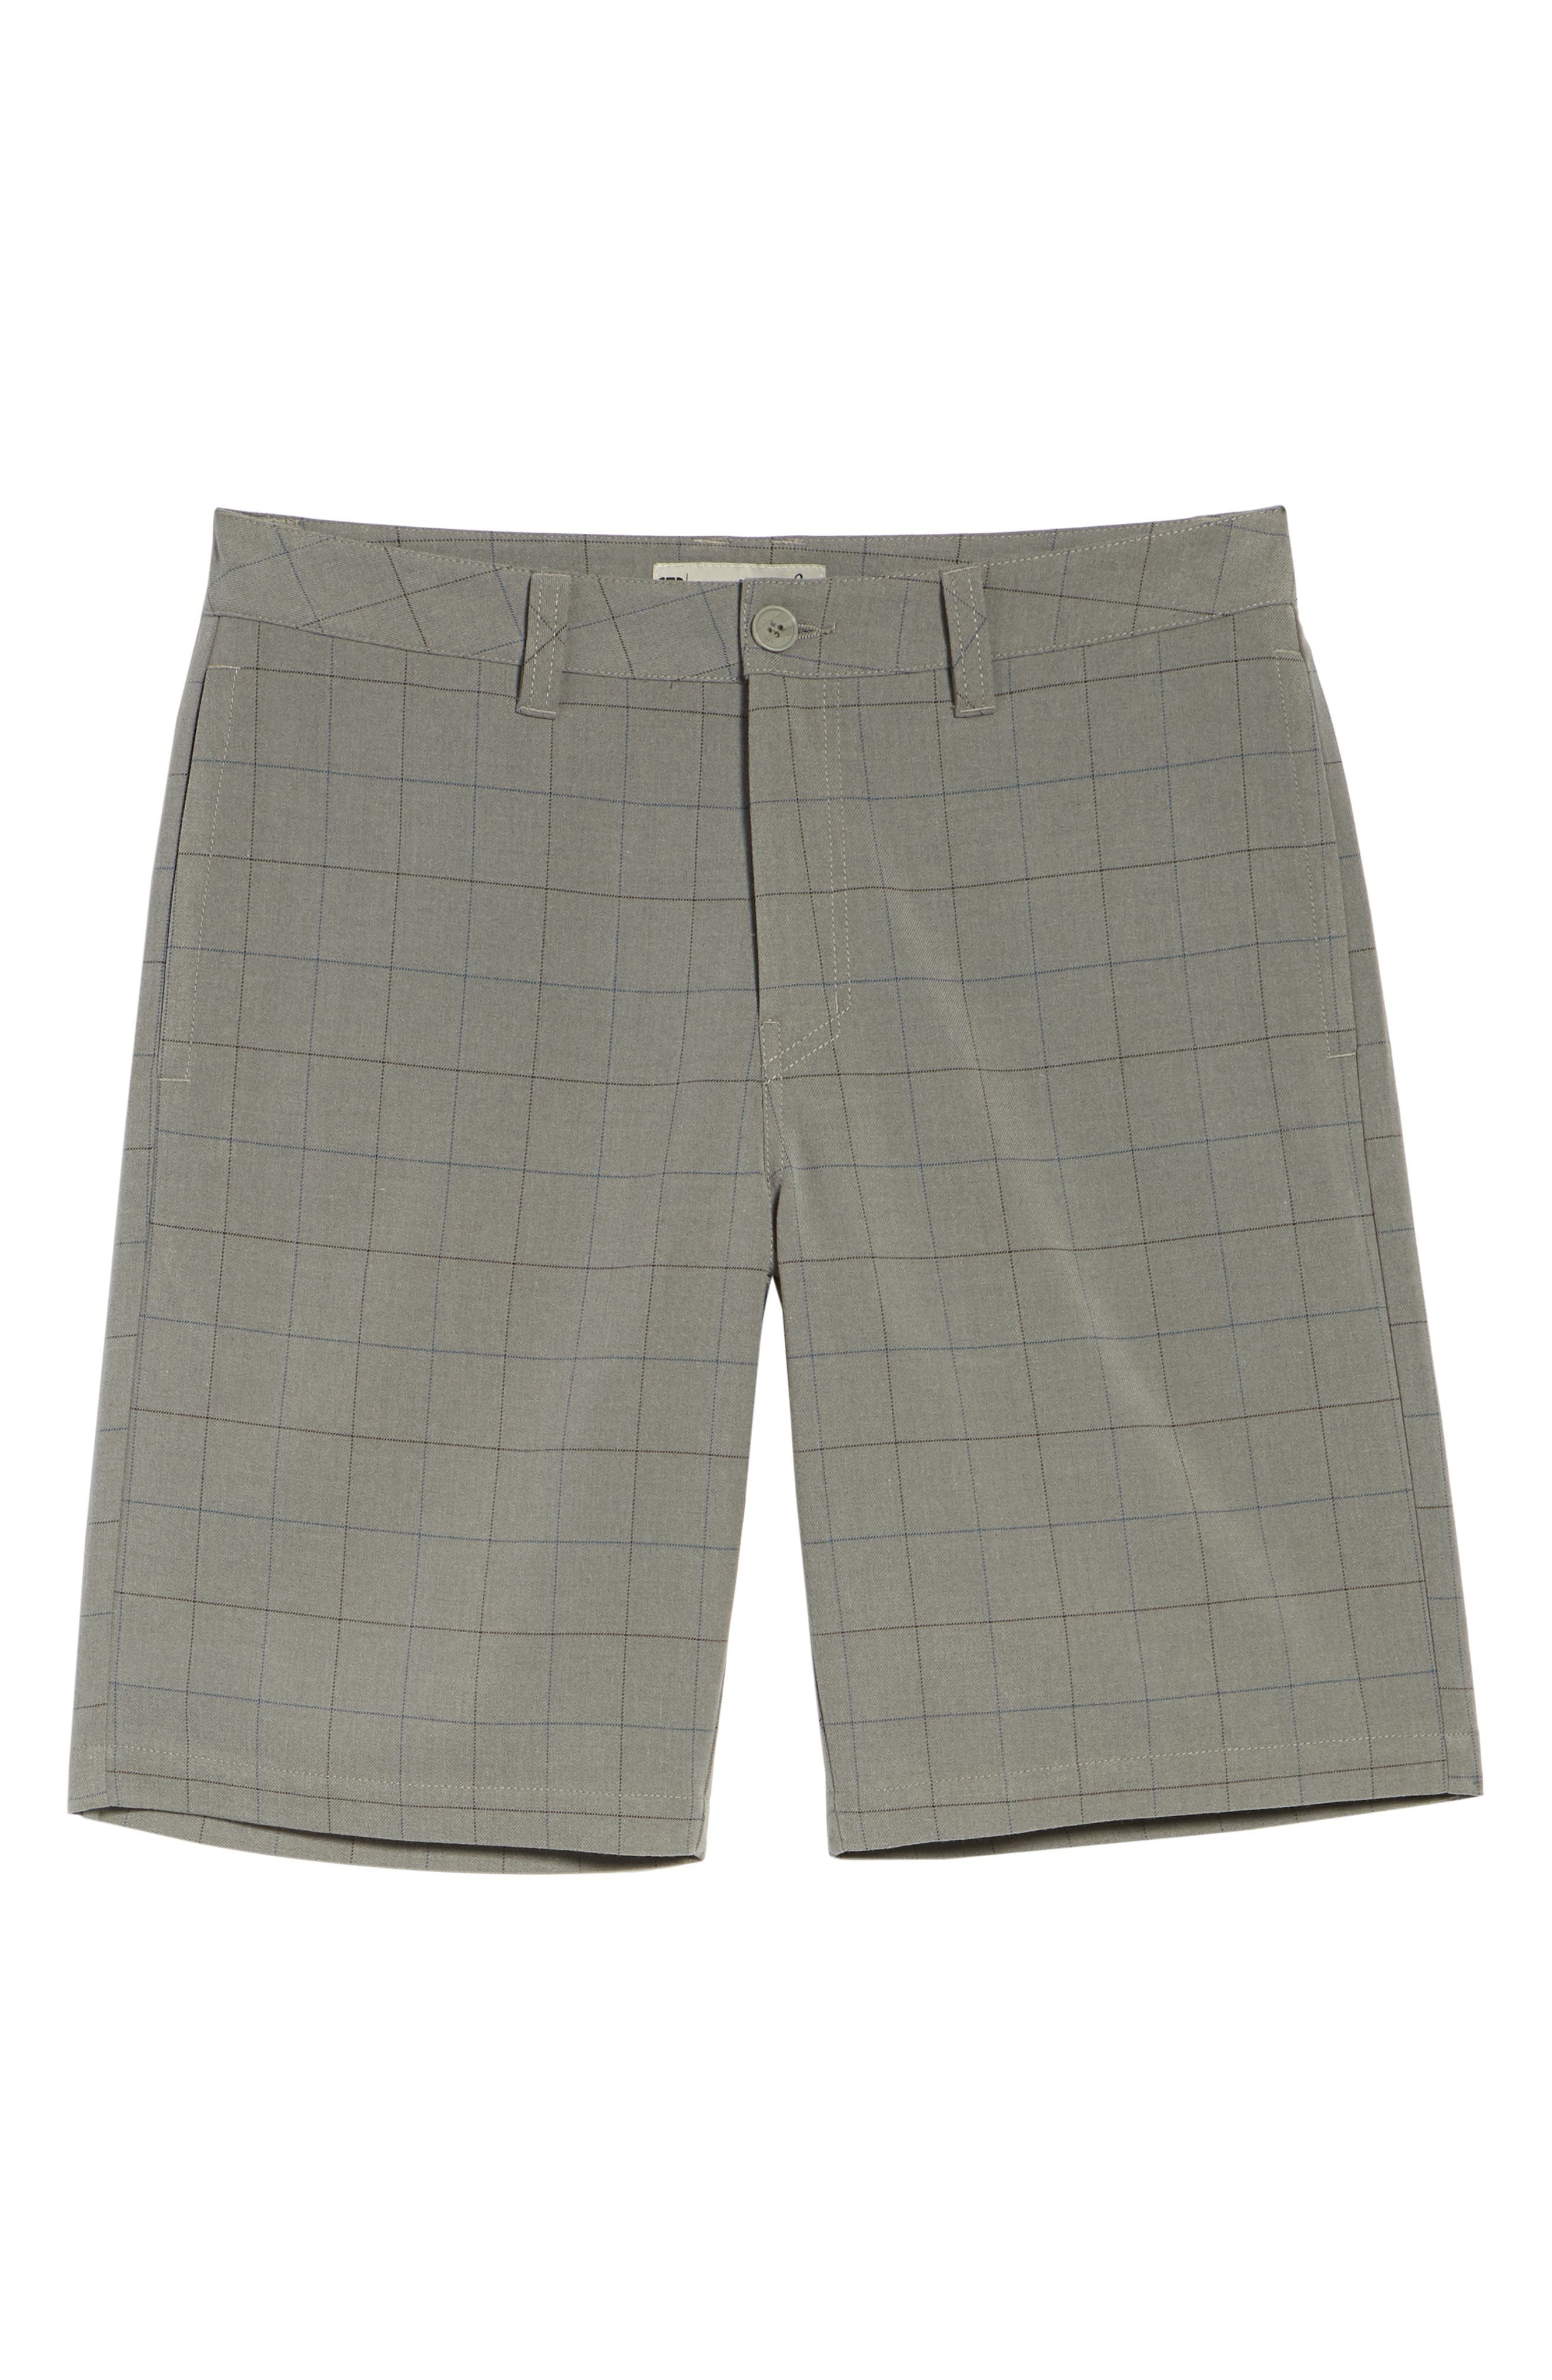 Rickles Regular Fit Shorts,                             Alternate thumbnail 6, color,                             HEATHER SHARKSKIN